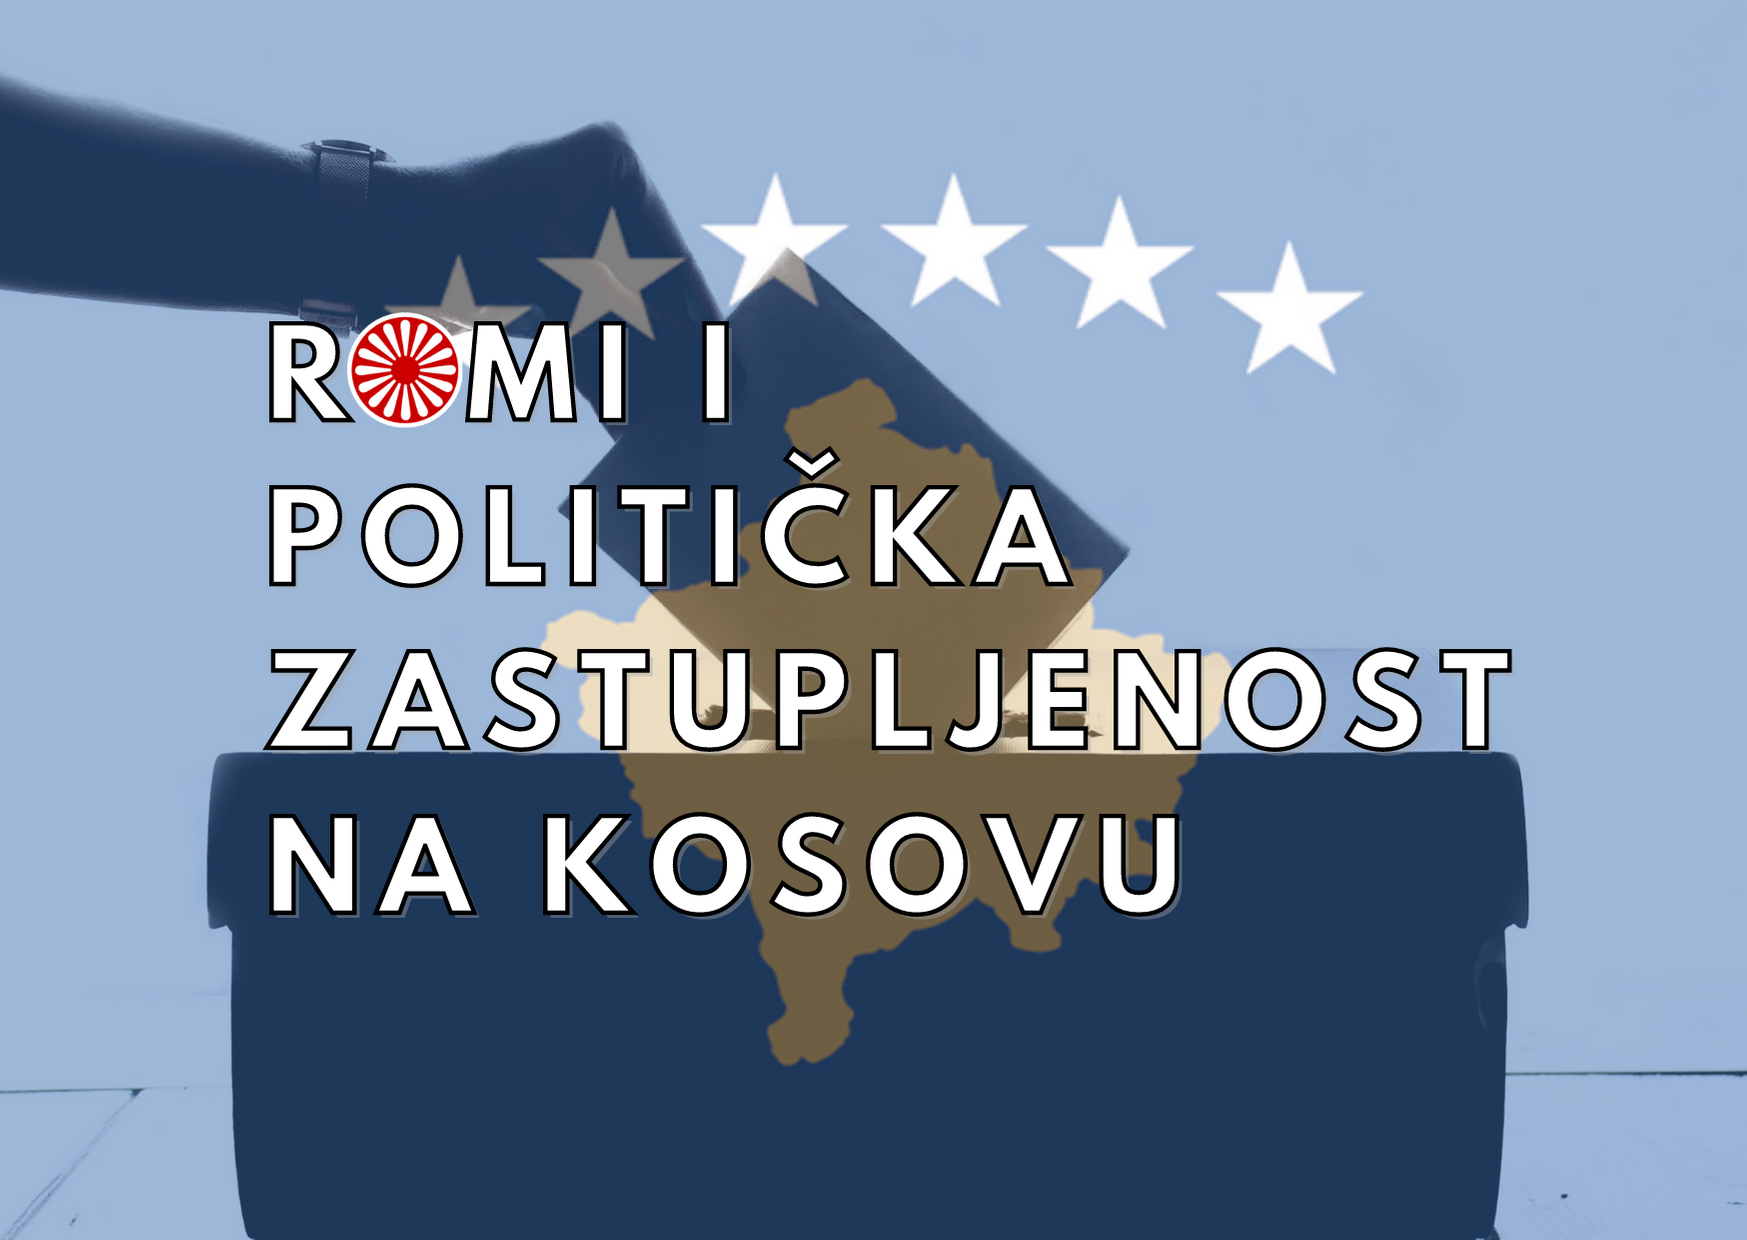 Roma and political representation in kosovo (3) (1) PARLAMENTARI IZBORI NA KOSOVU I ZASTUPANJE ROMA